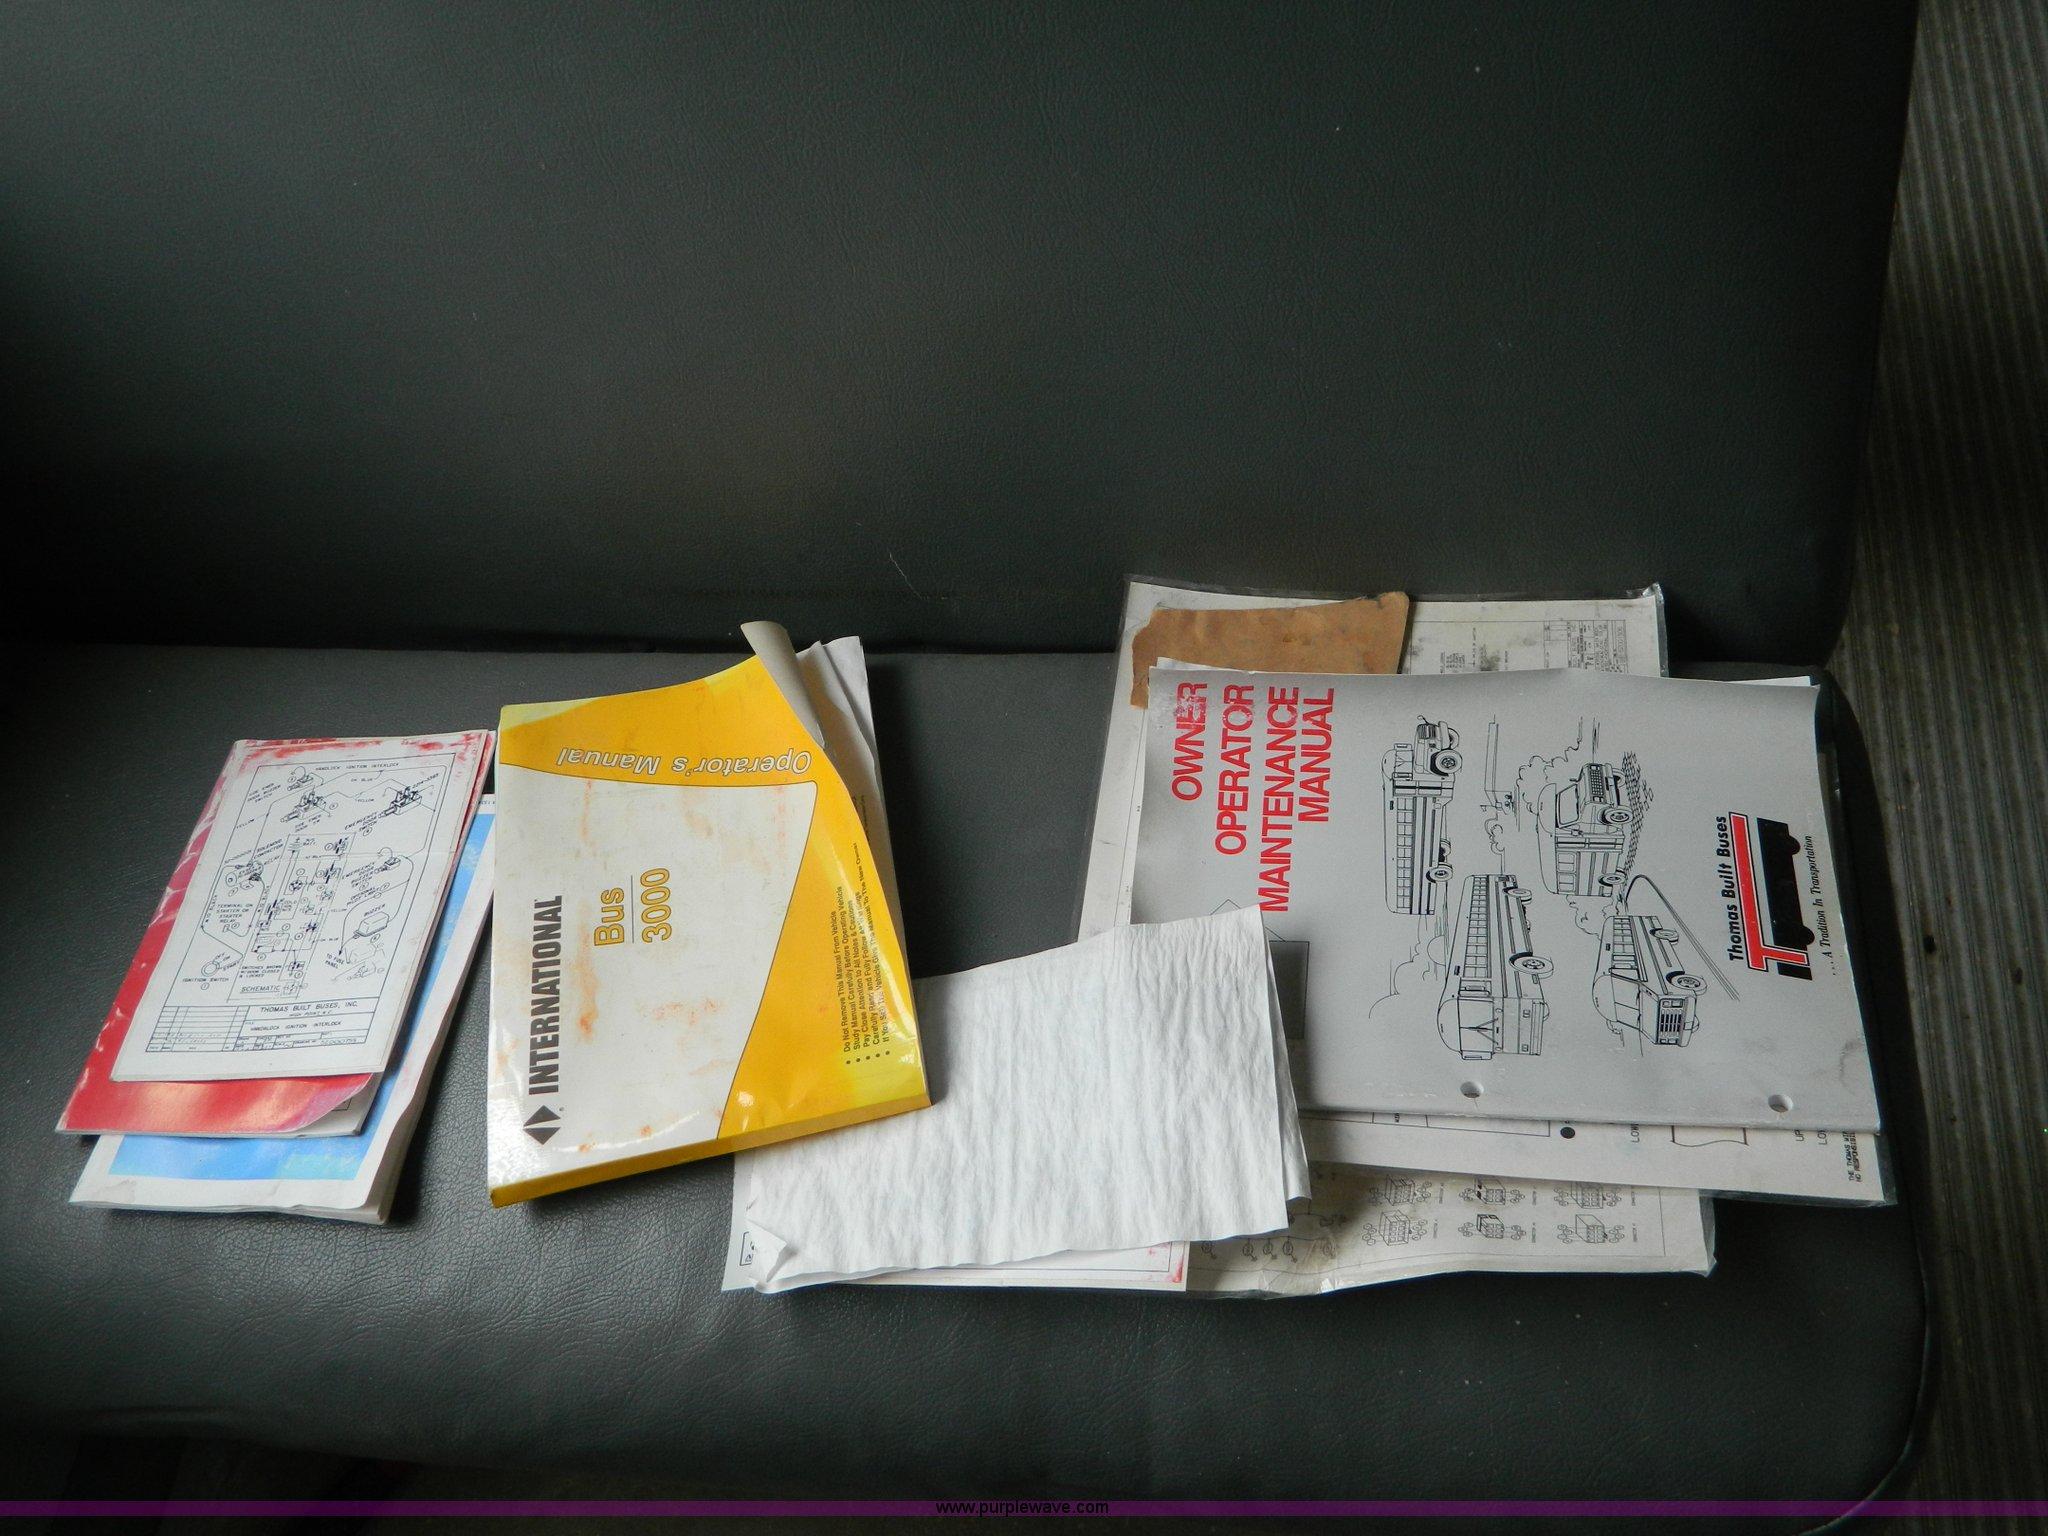 Thomas Bus Manual 2001 Yamaha Ox66 Wiring Diagram Schematic Fs Array 1995 International School Item D6009 Sold Se Rh Purplewave Com